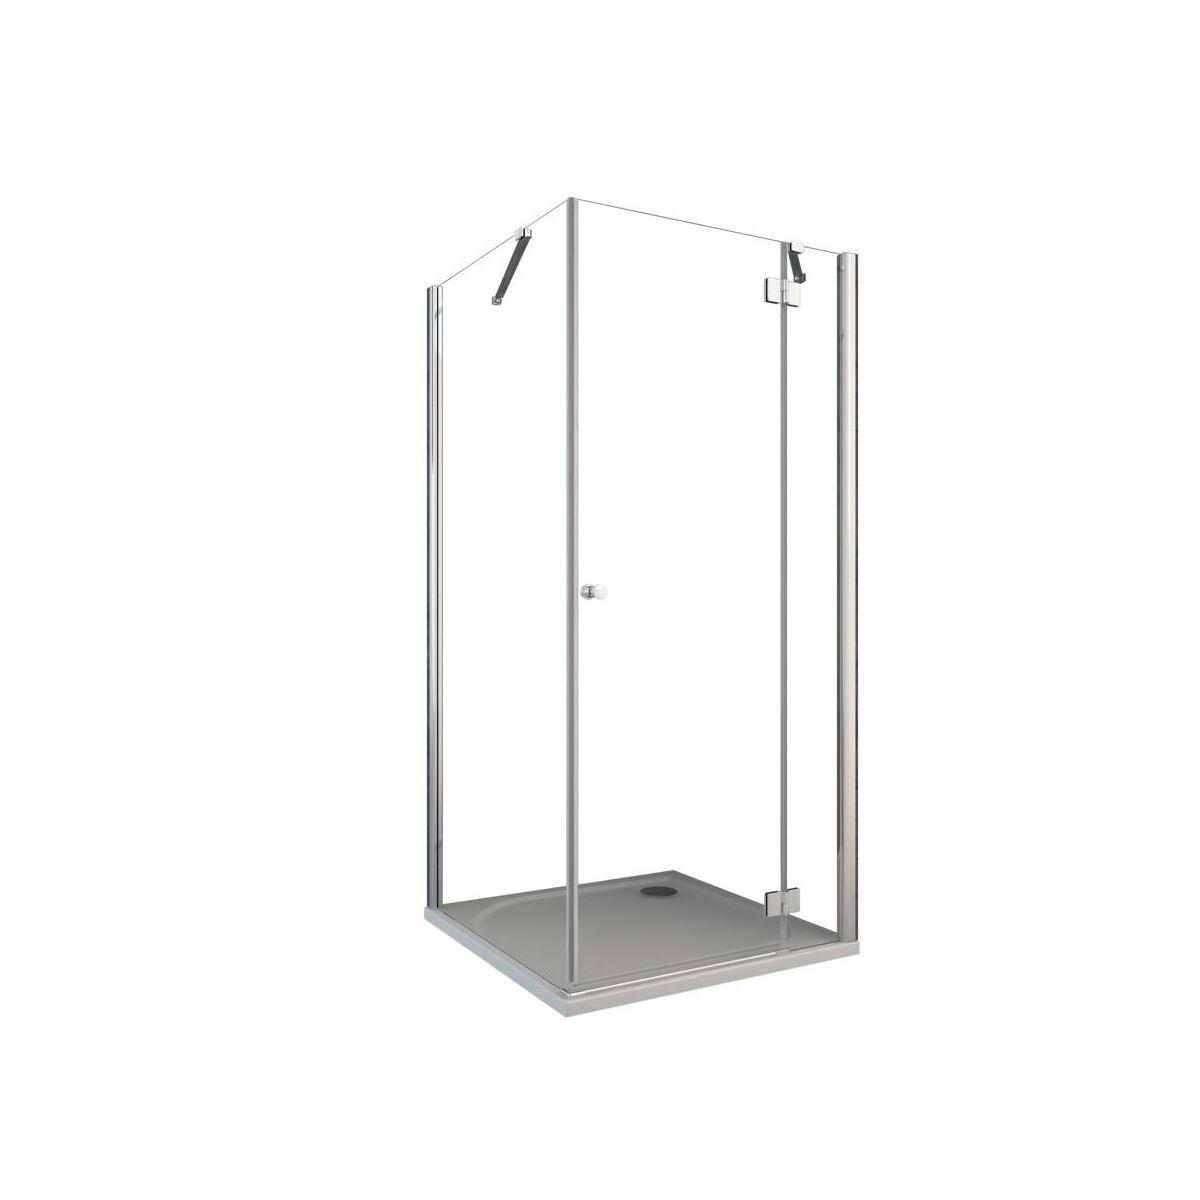 kabina prysznicowa valence iridum kabiny prysznicowe w. Black Bedroom Furniture Sets. Home Design Ideas